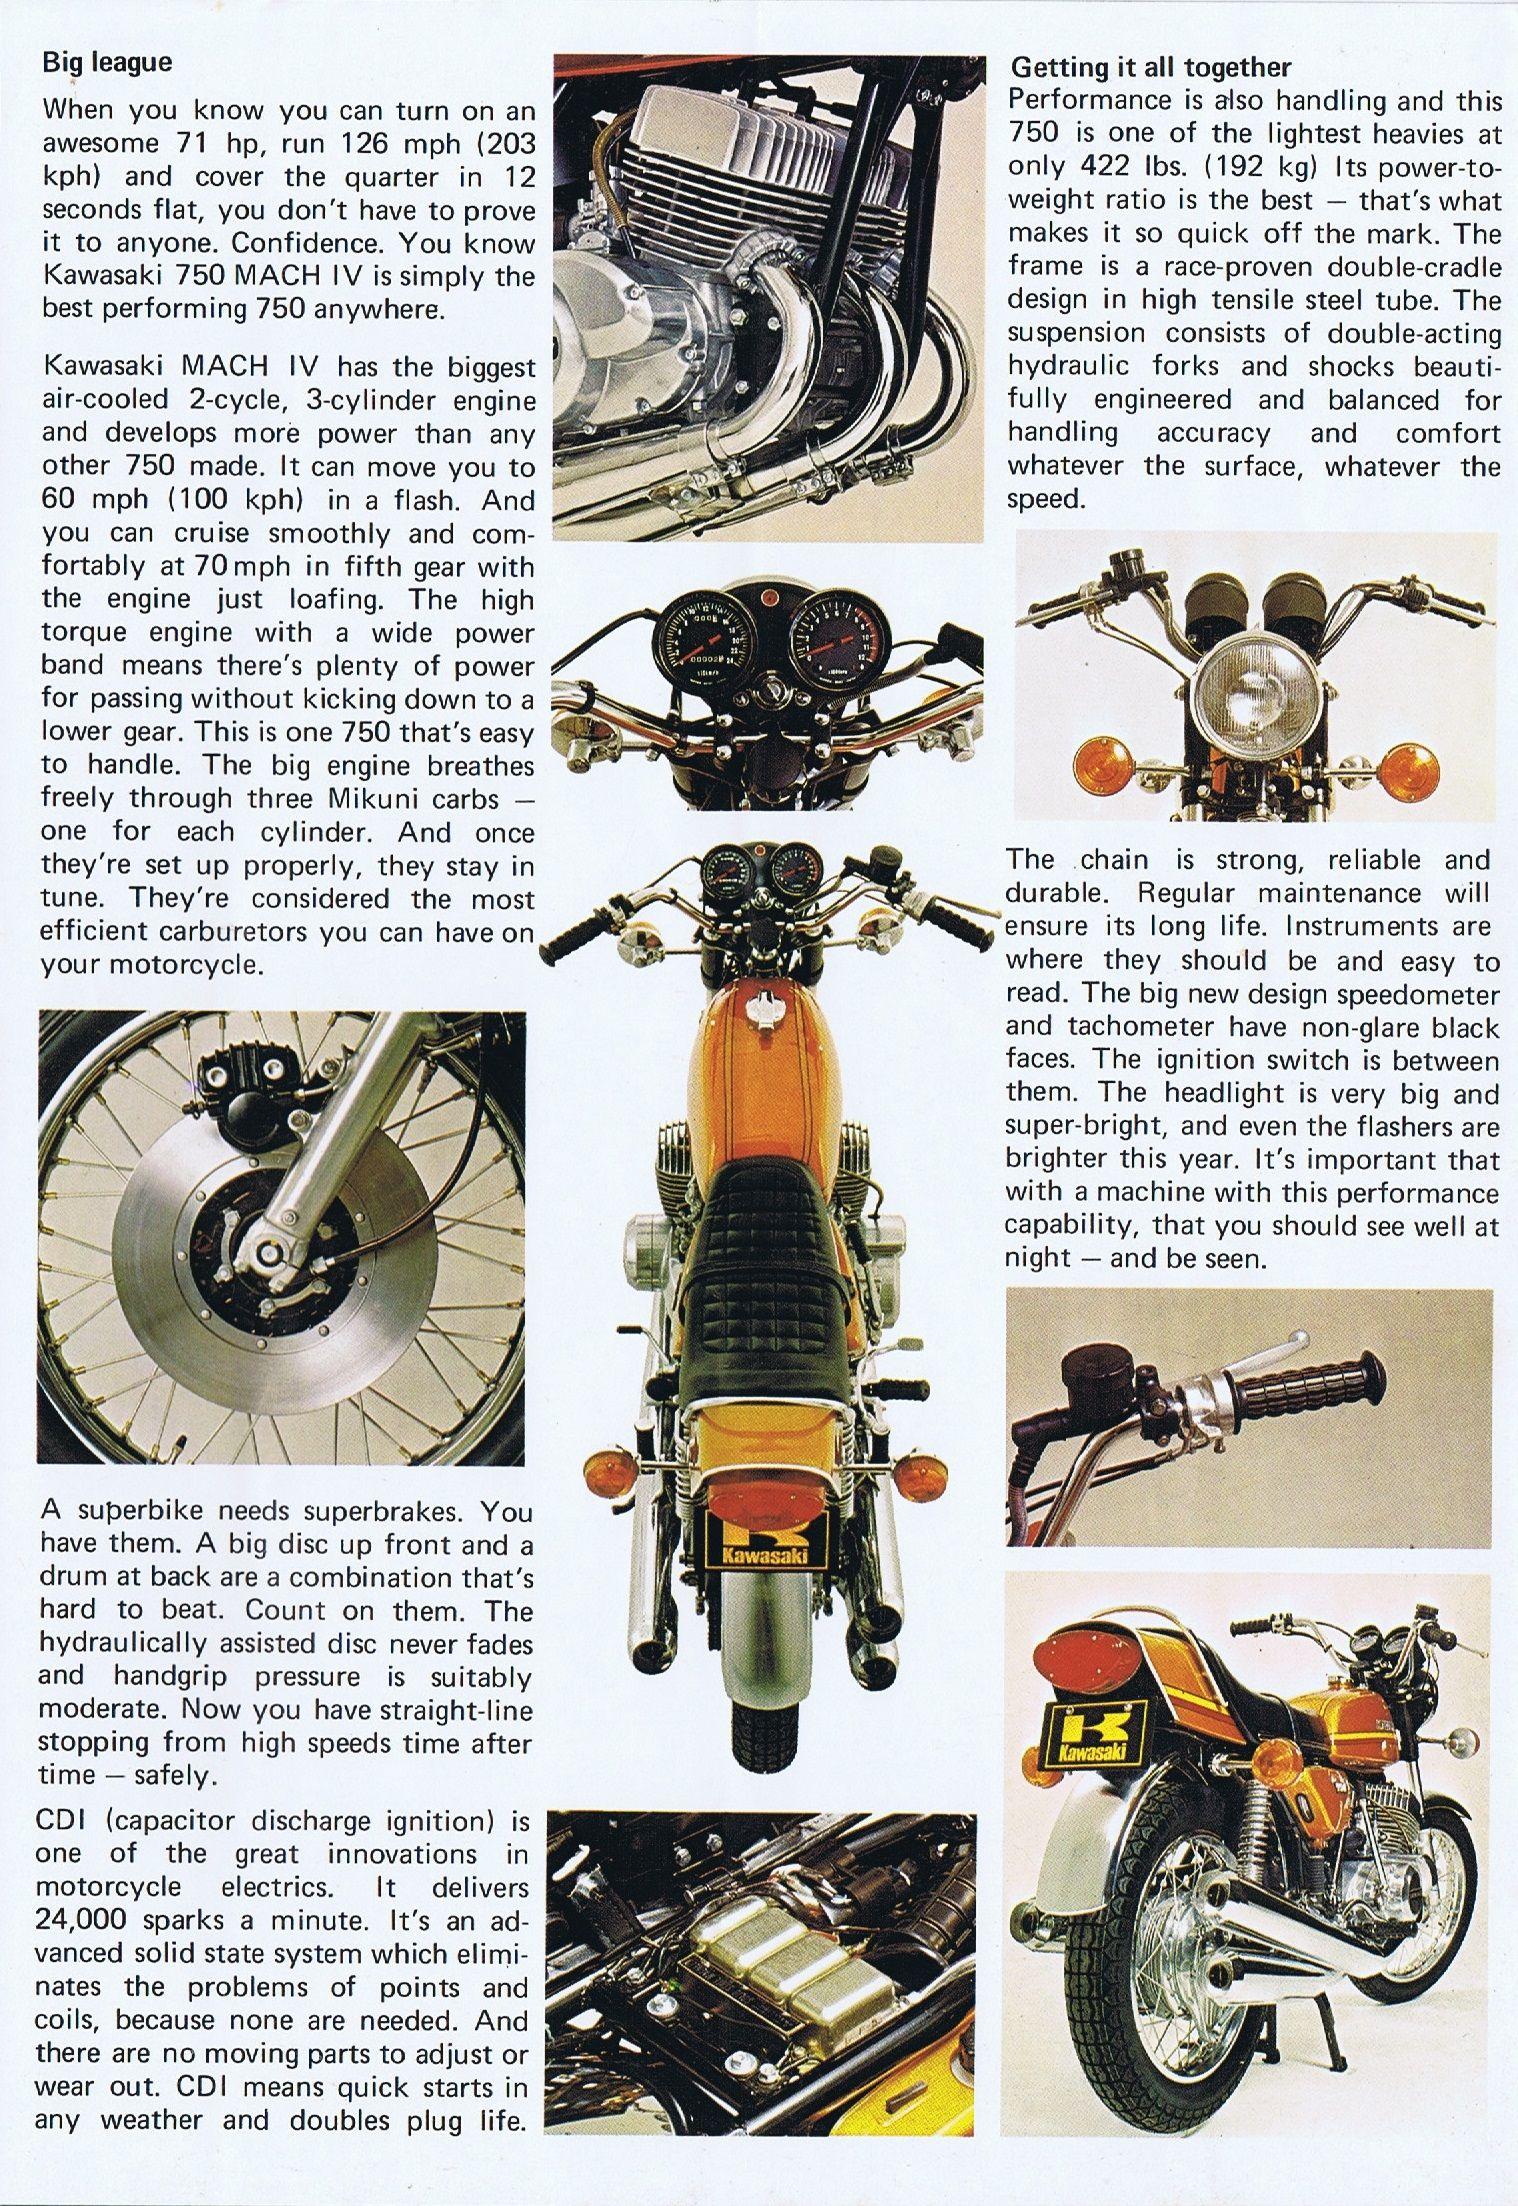 1973_Kawasaki 750 Mach IV H2 2-stroke brochure GB_05